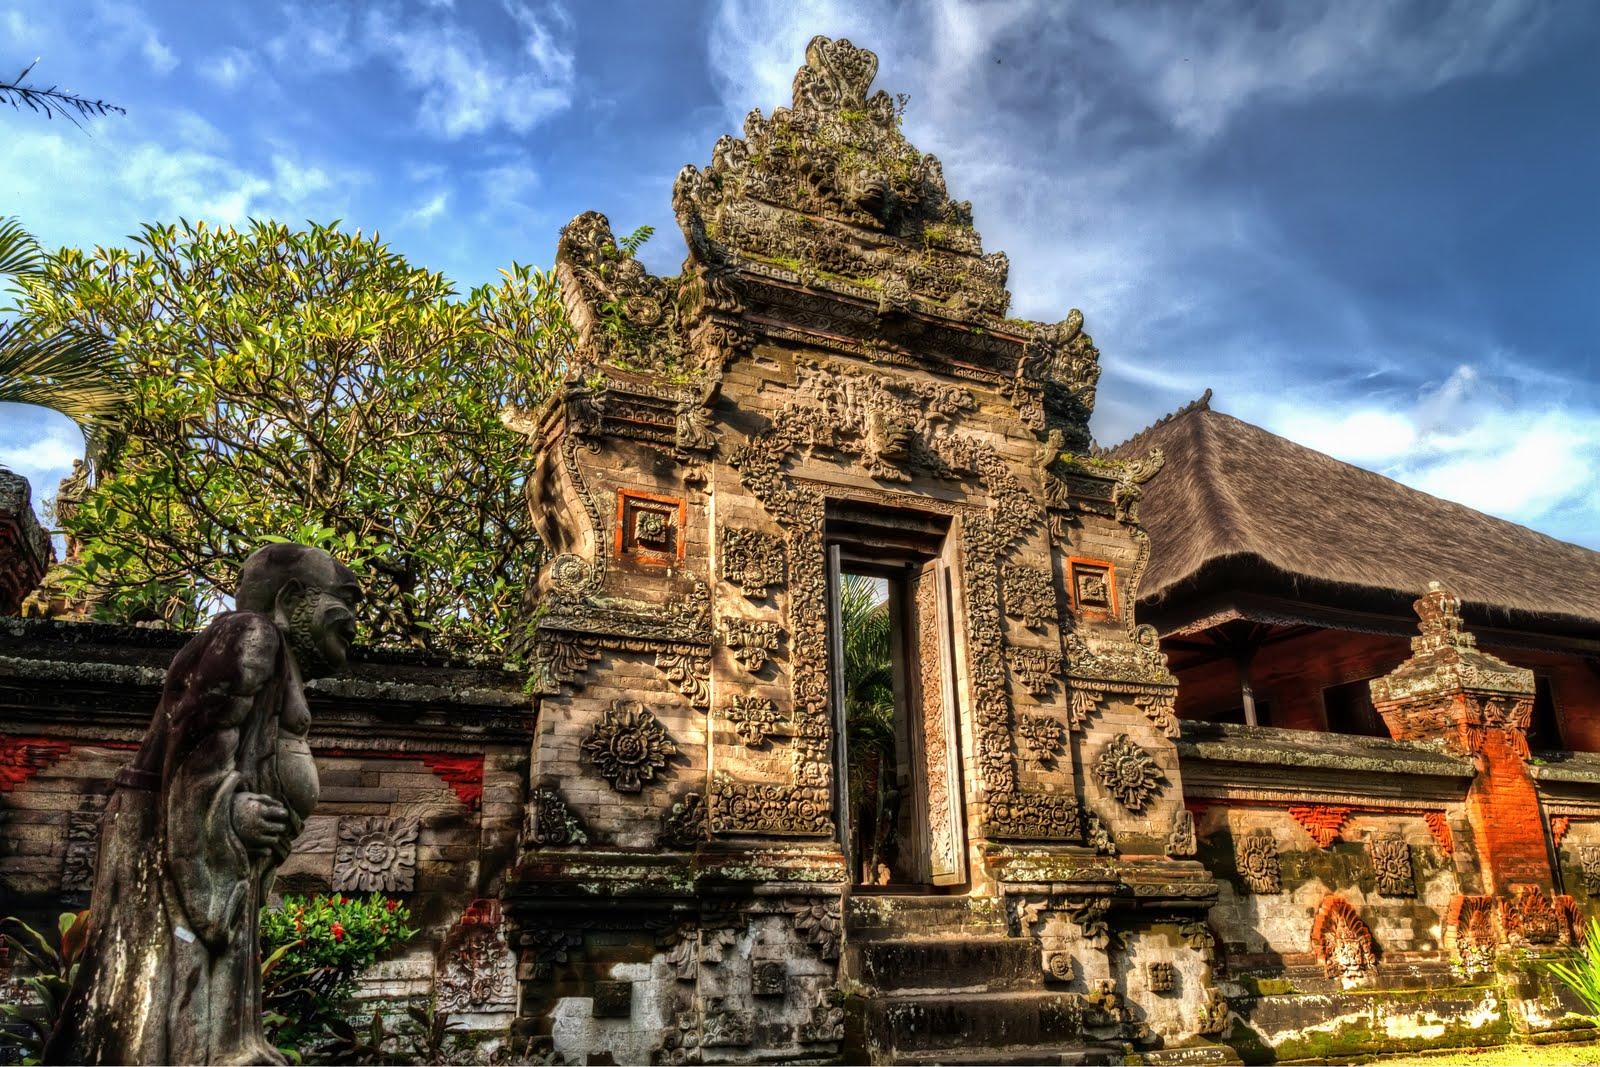 Wisata Murah Ke Bali Ala Backpacker